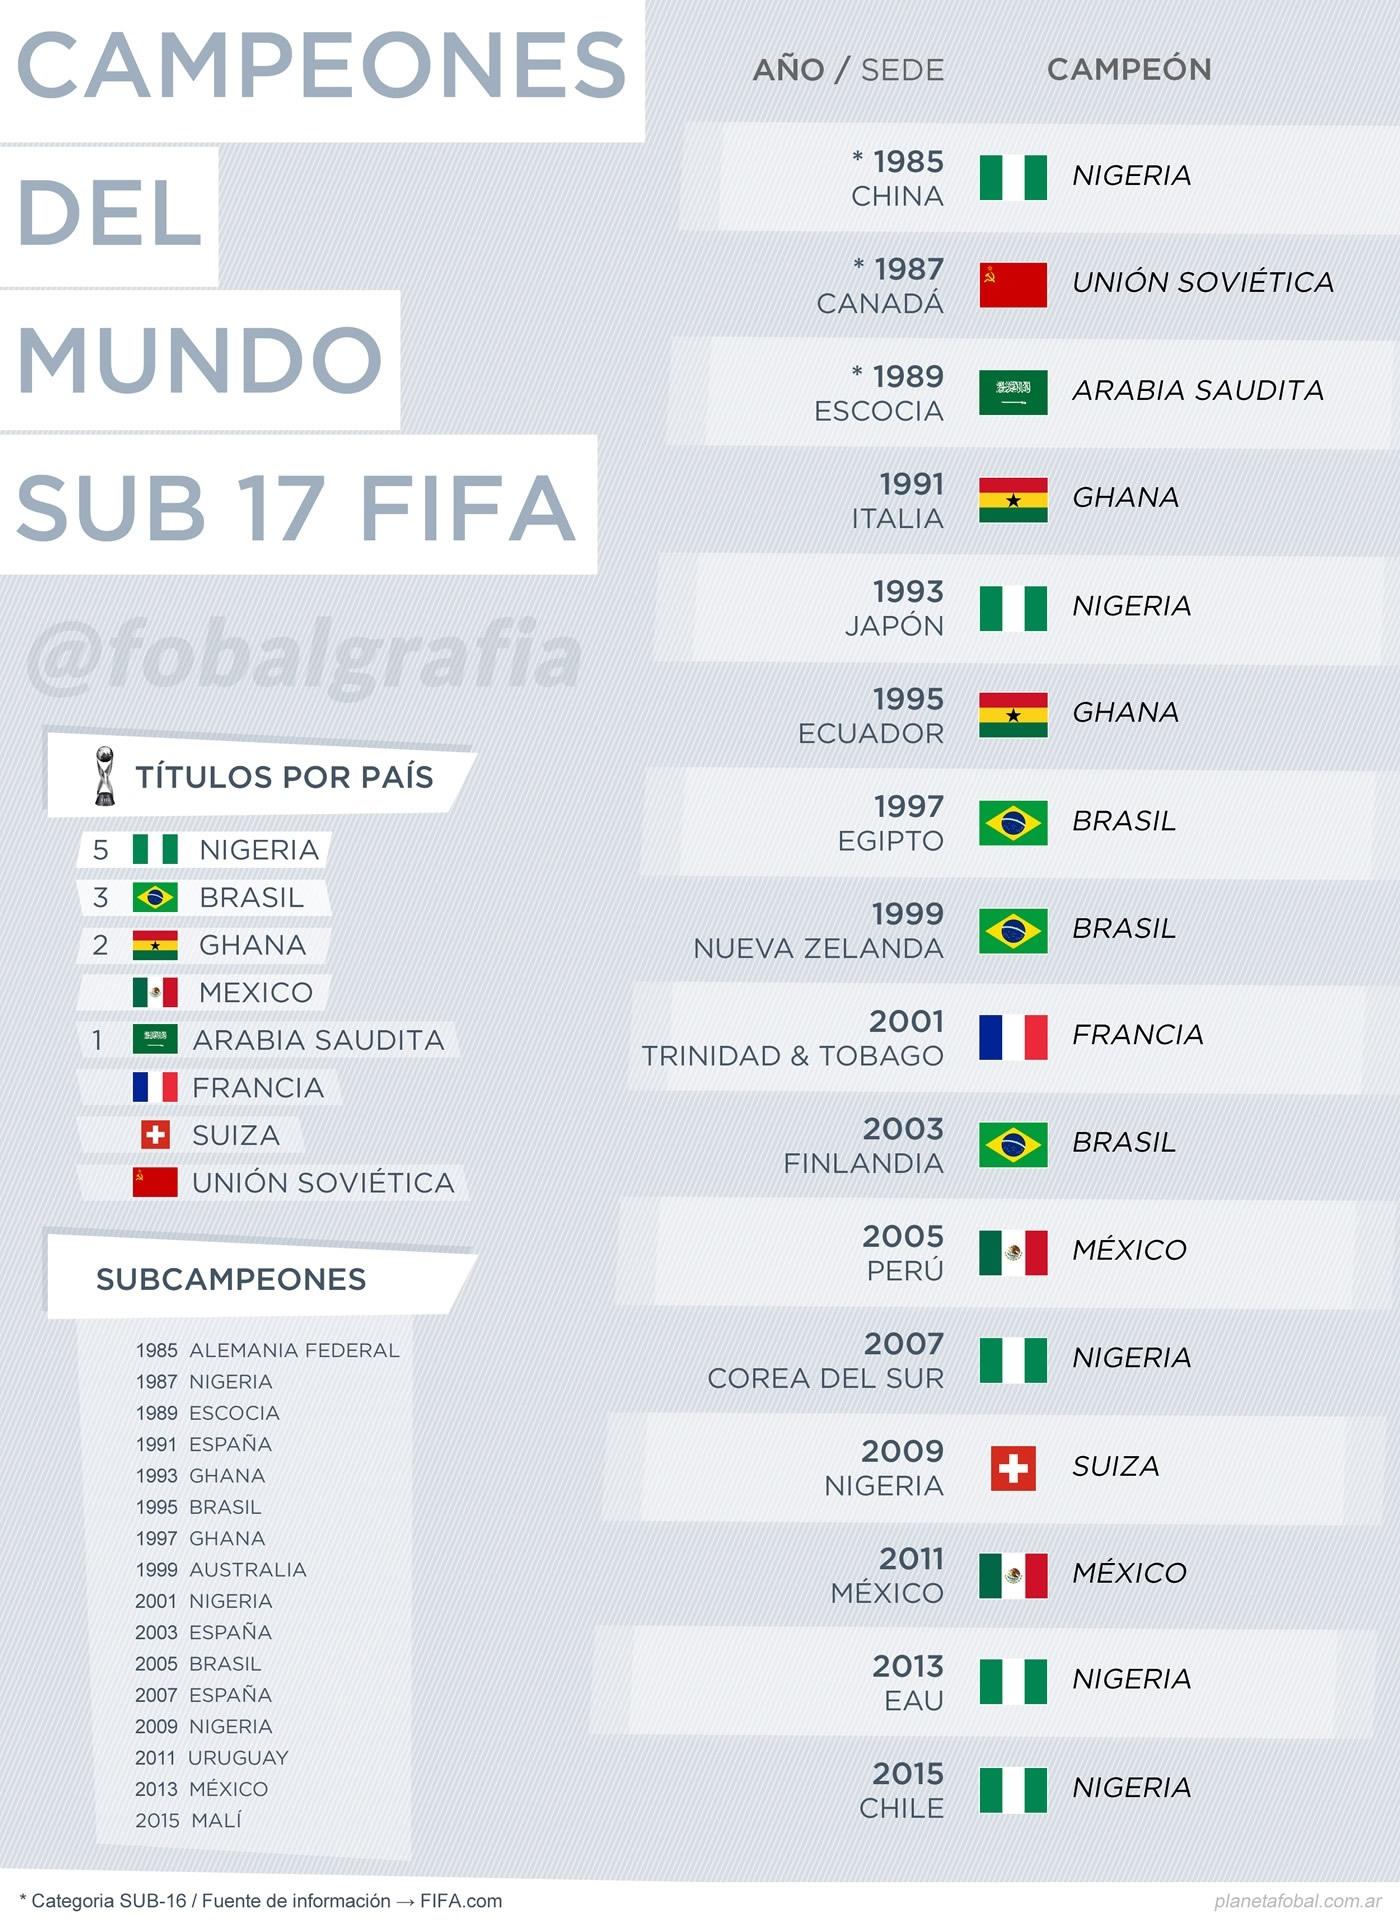 Campeones del Mundo Sub 17